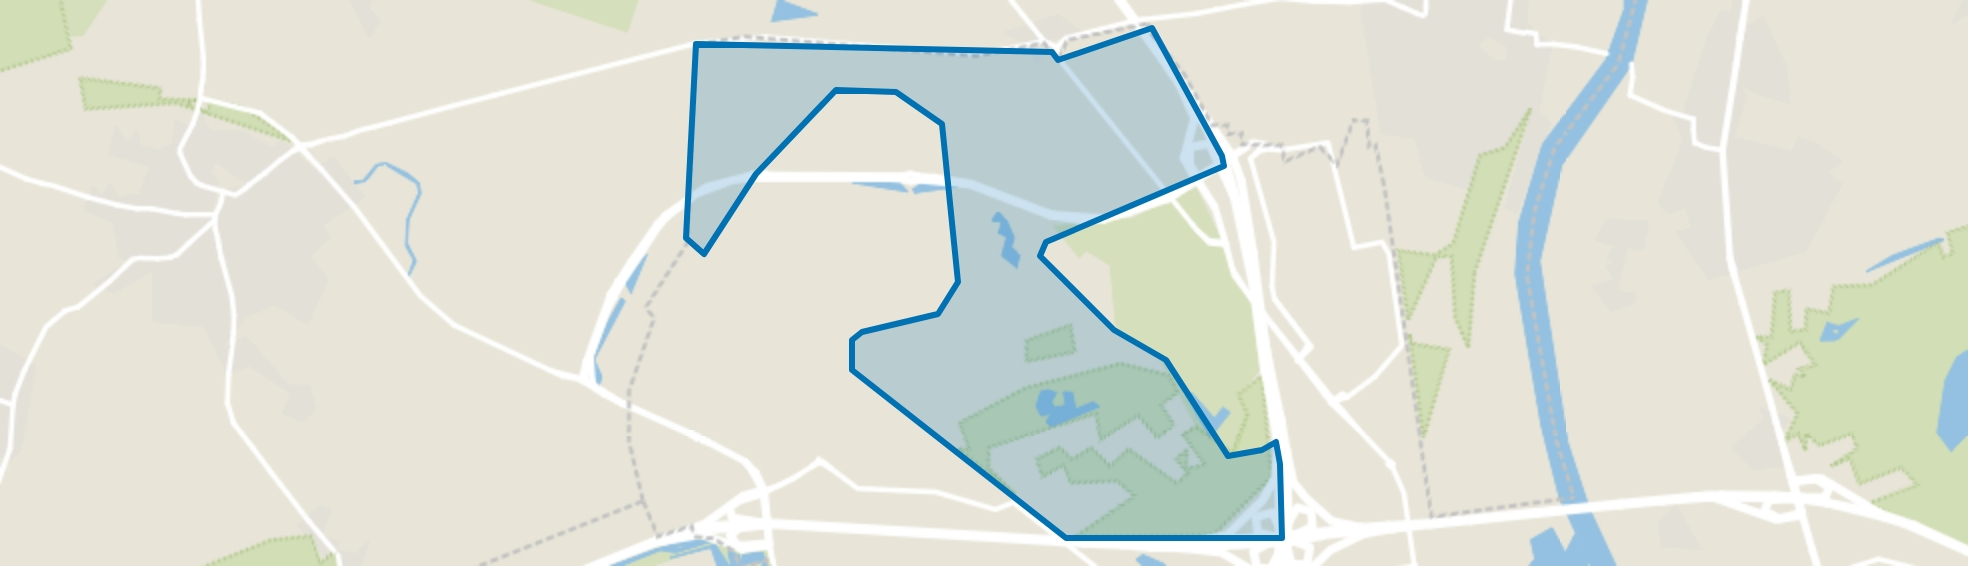 Zaarderheiken, Venlo map